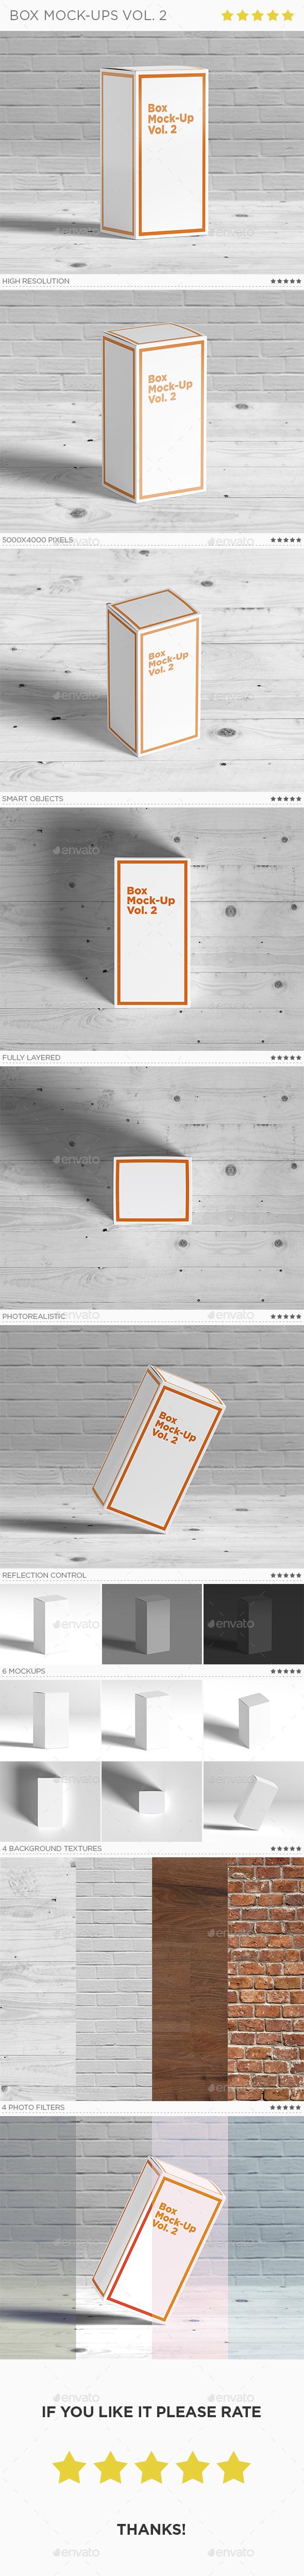 Box Mock-Ups vol. 2 - Packaging Product Mock-Ups